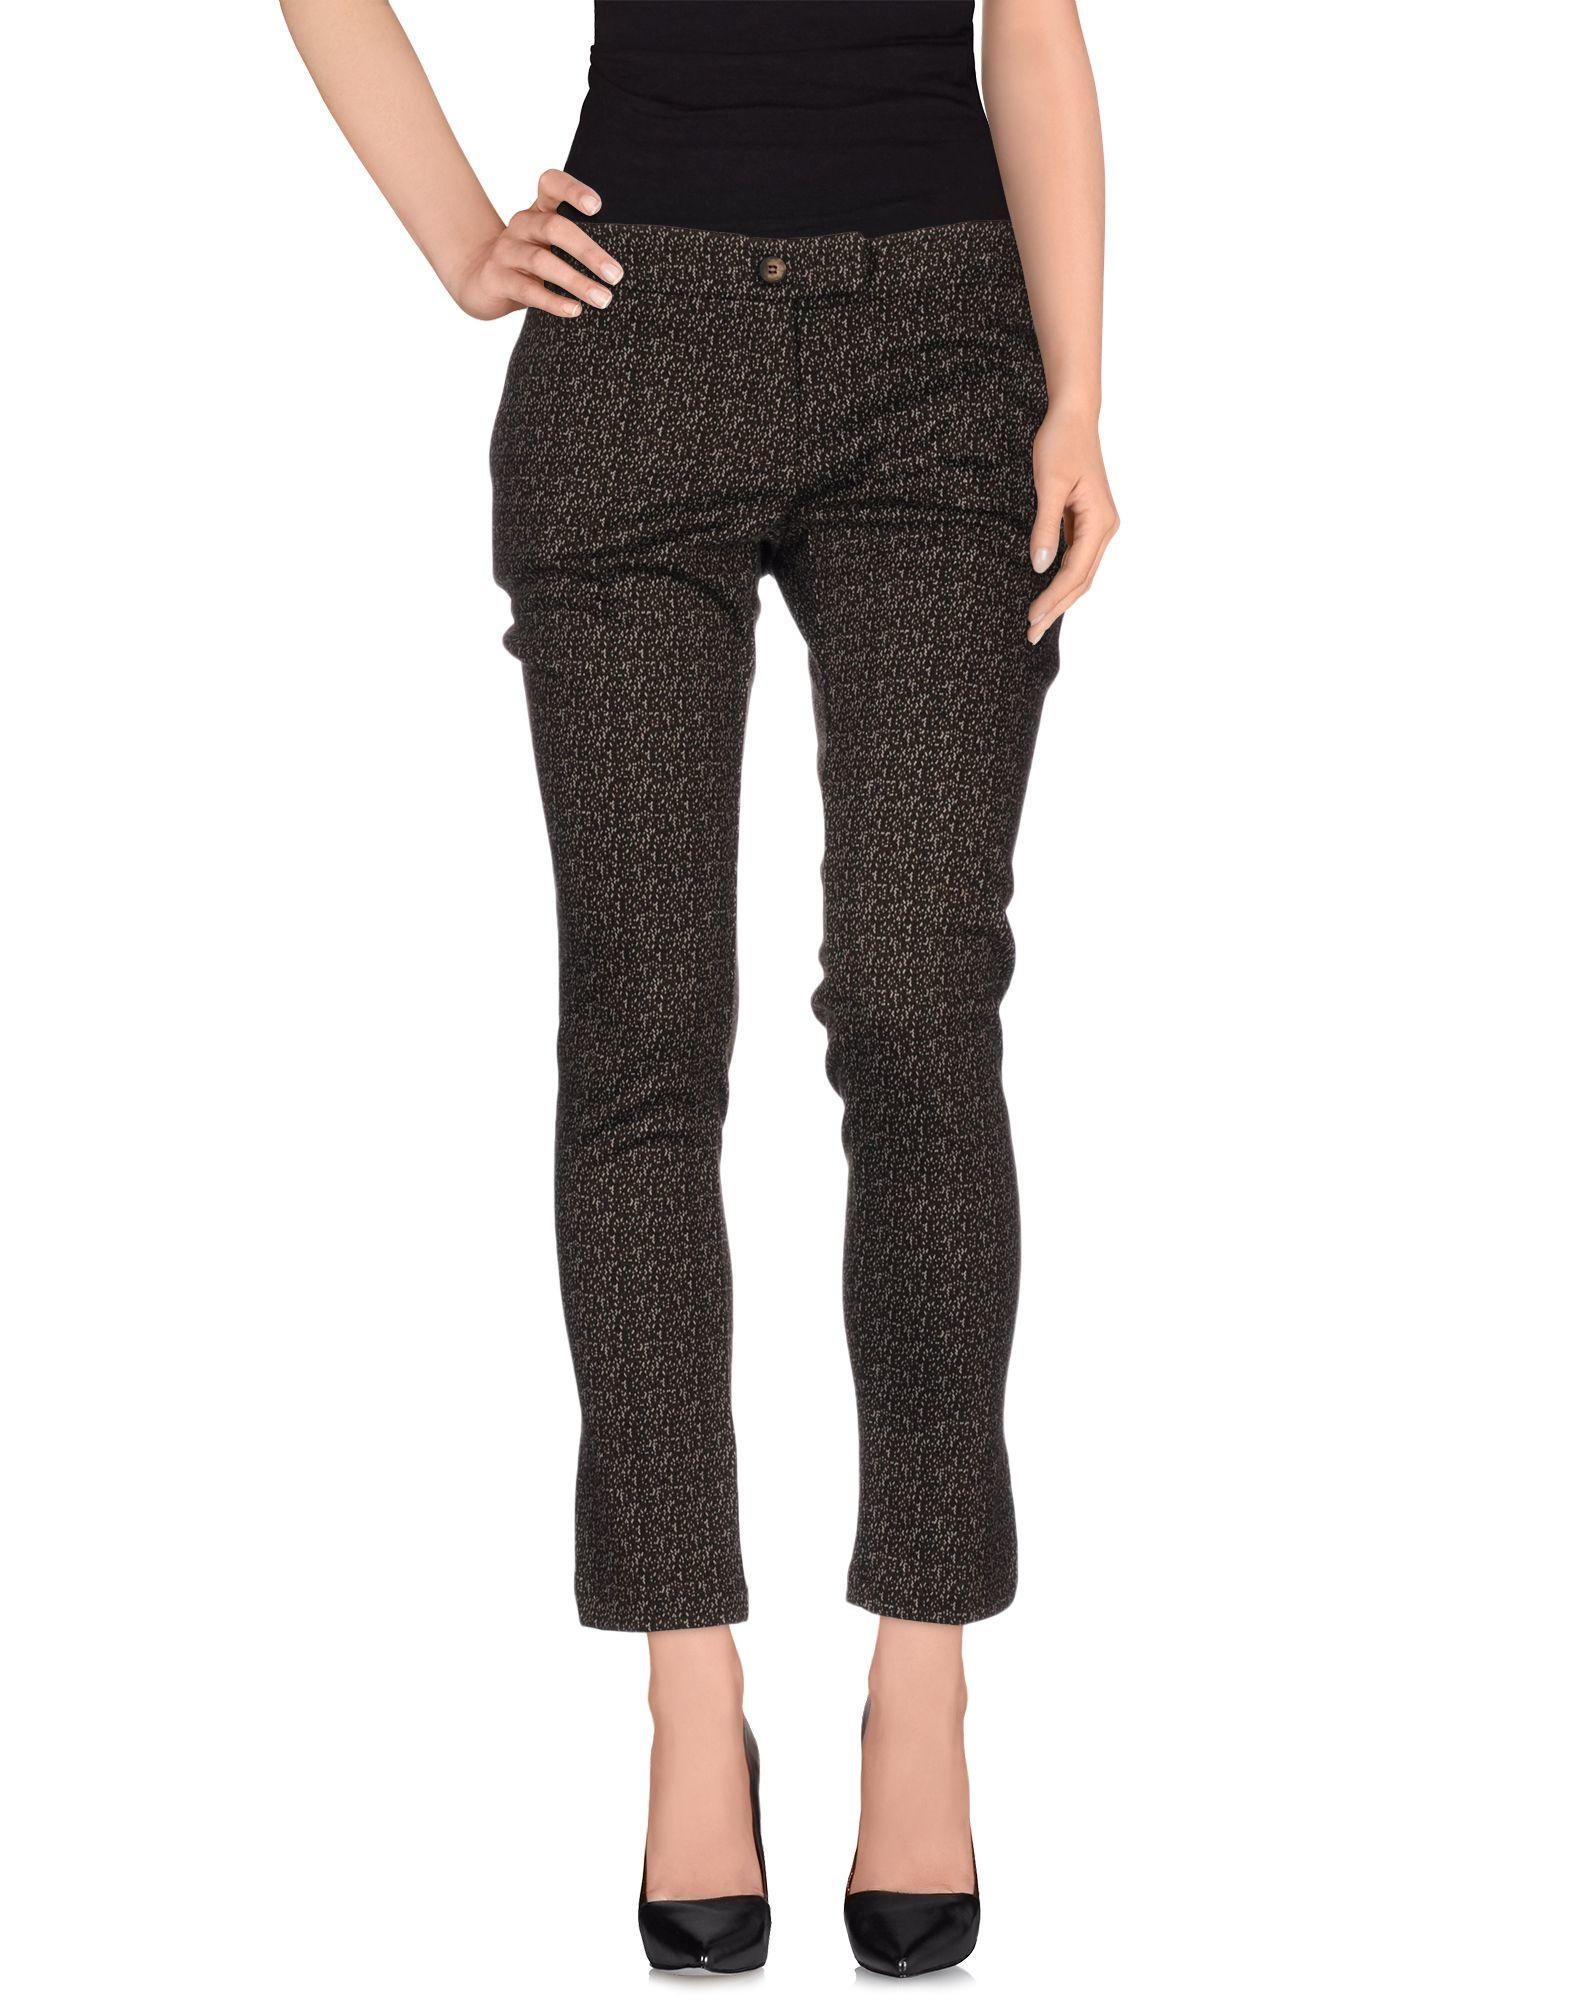 Agatha Cri Synthetic Casual Pants in Dark Brown (Brown)